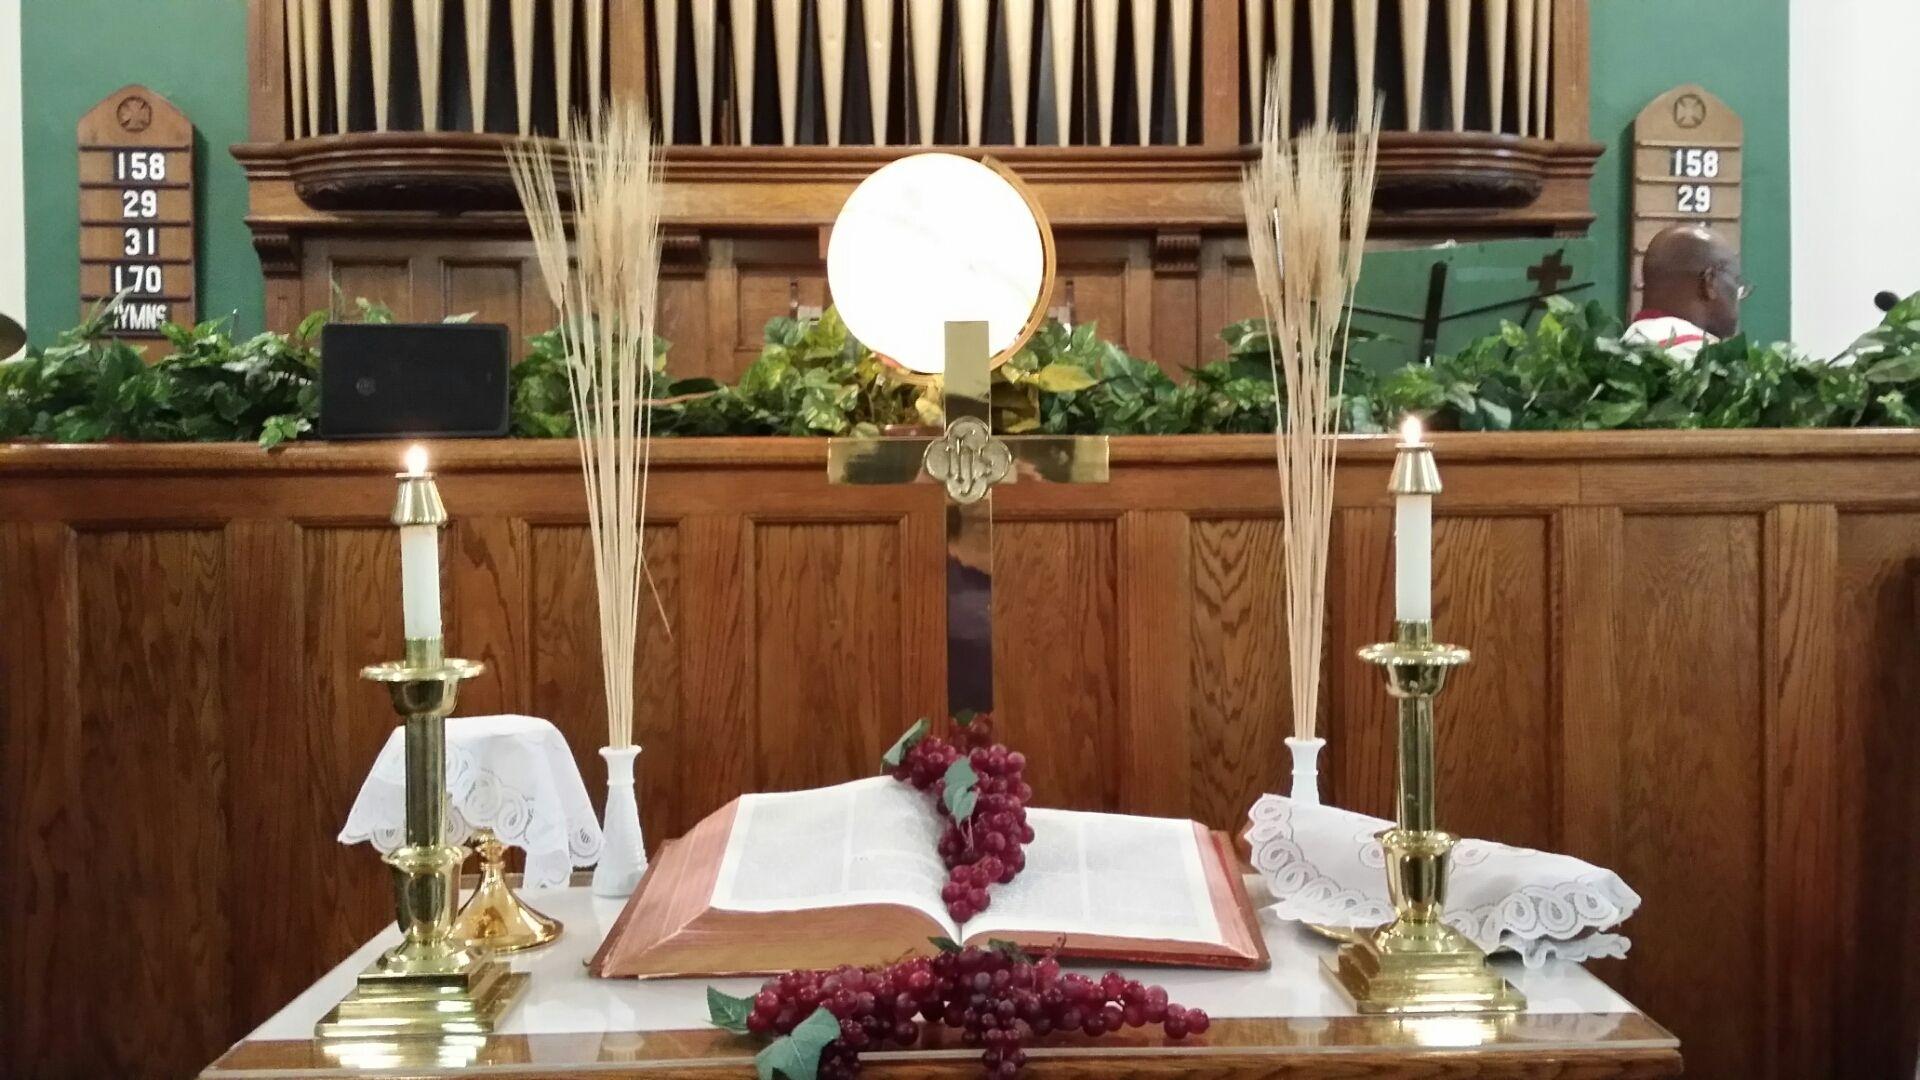 World Communion Sunday | Altar Decorations, Church Altar Decorations, Church Decor